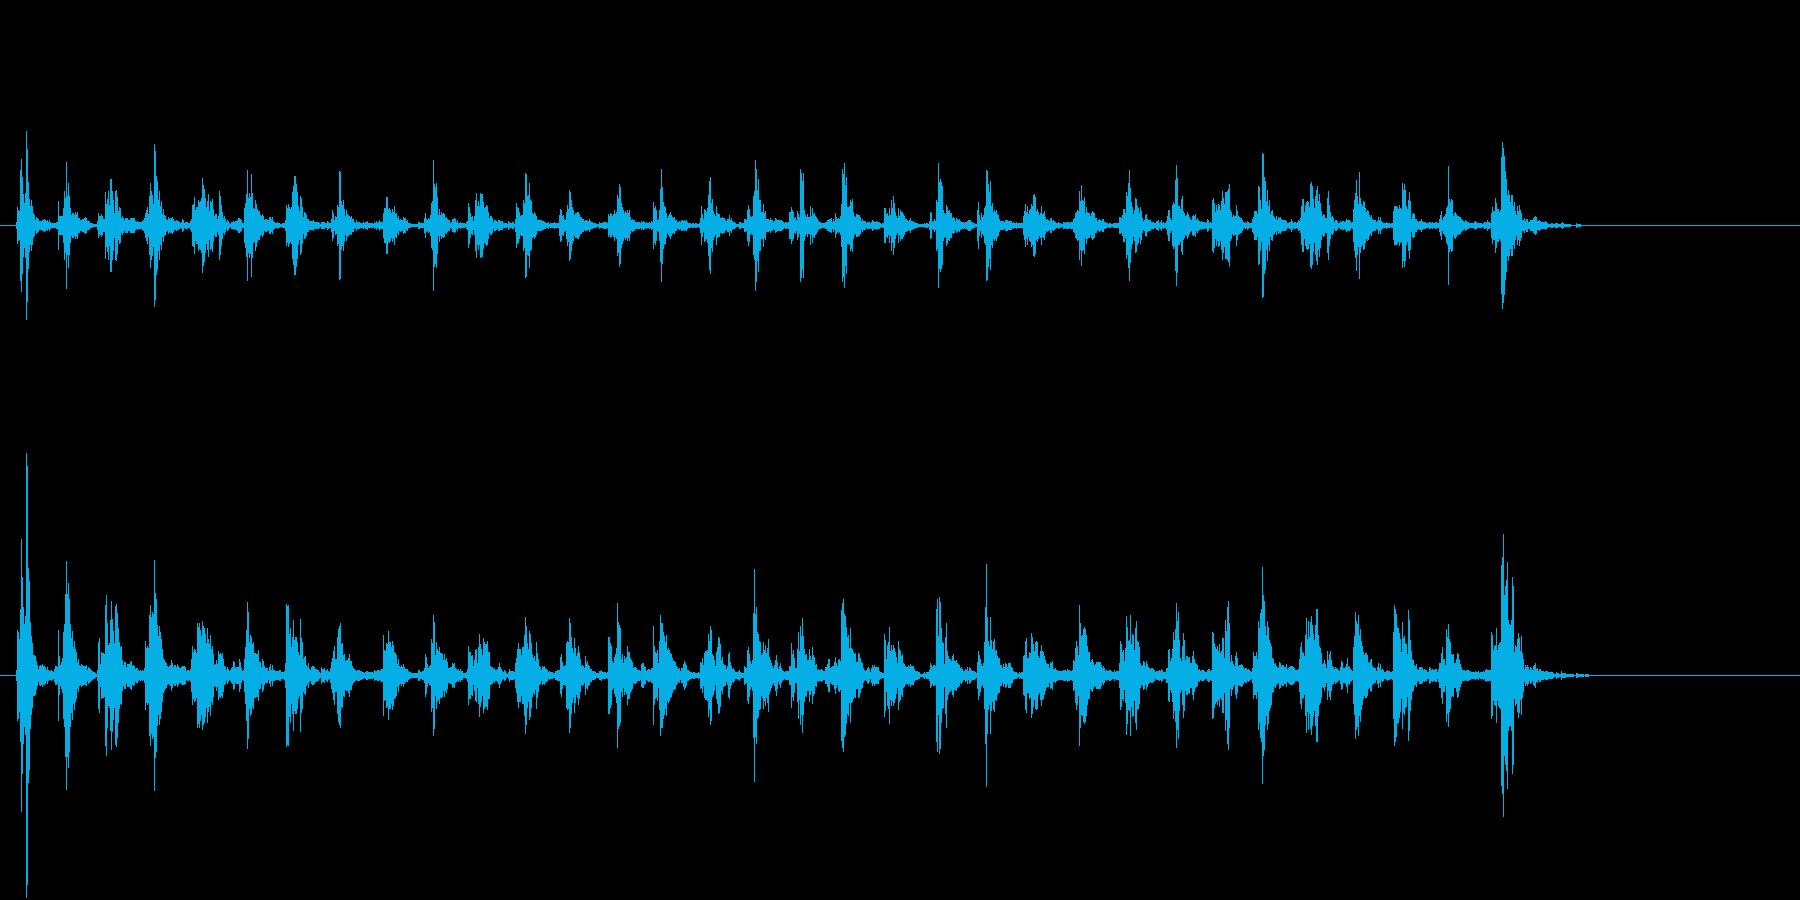 Xmasに最適トナカイベルのループ音10の再生済みの波形